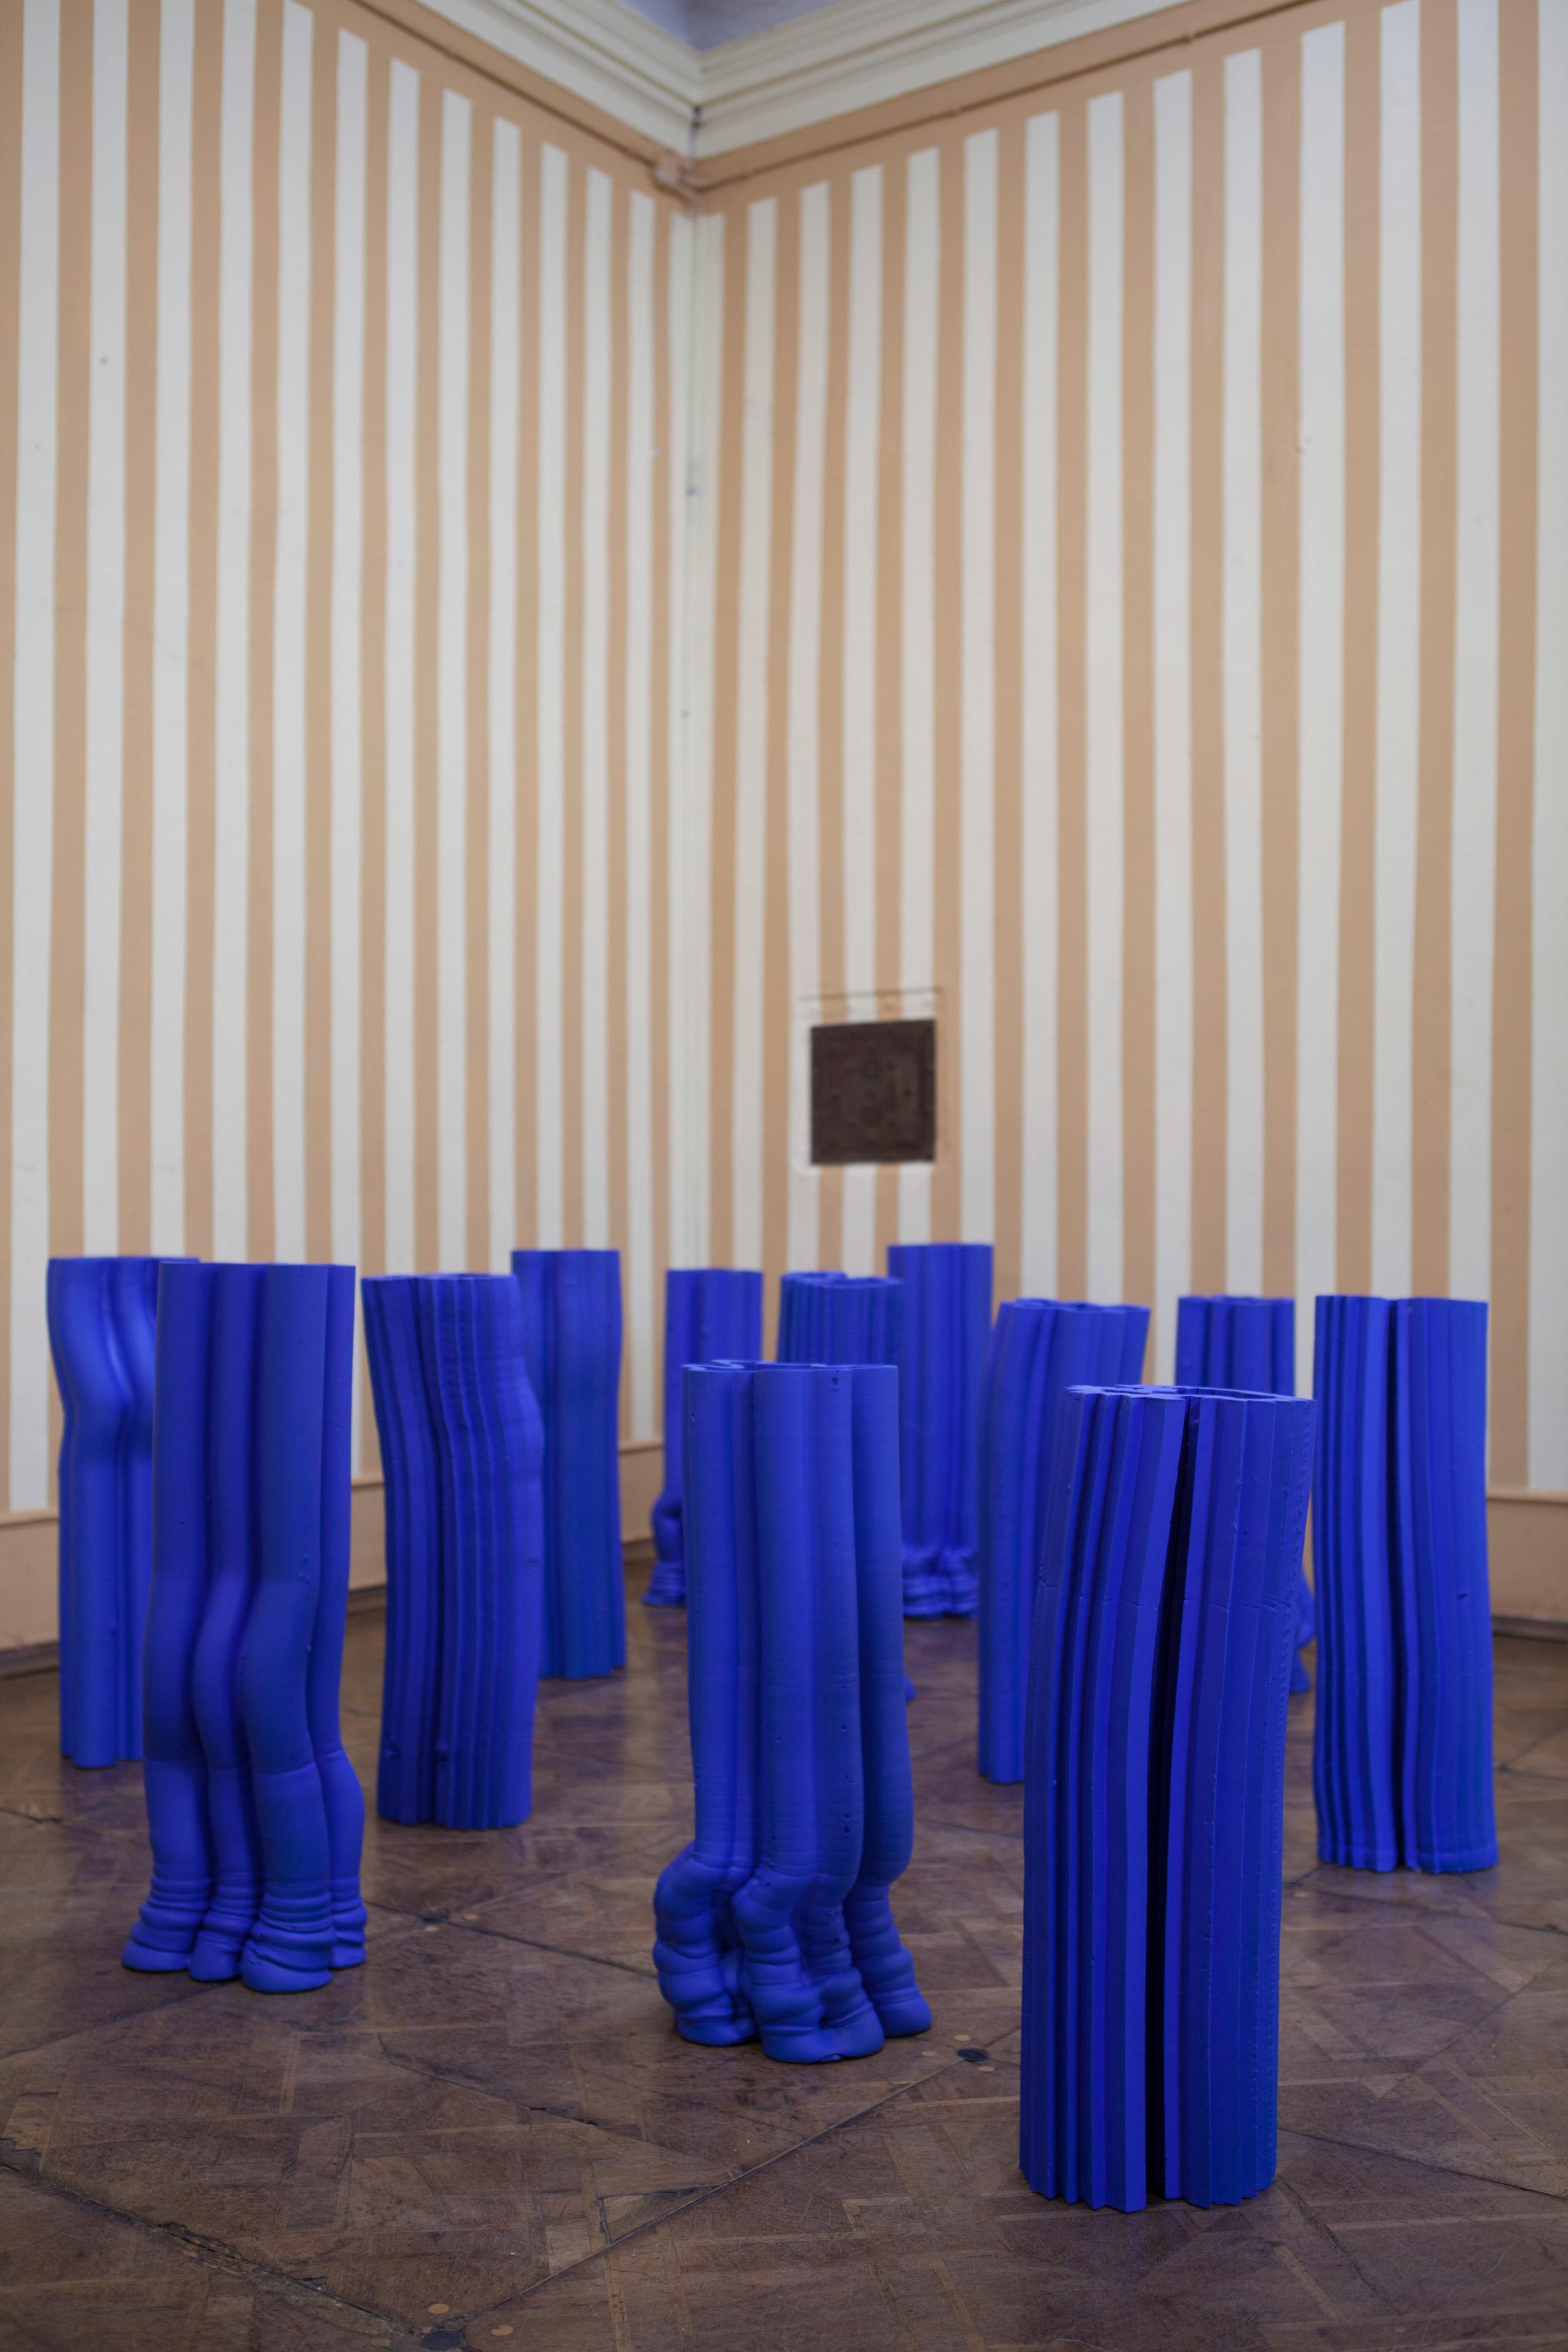 Anton Alvarez adopts Yves Klein's signature blue for extruded vases